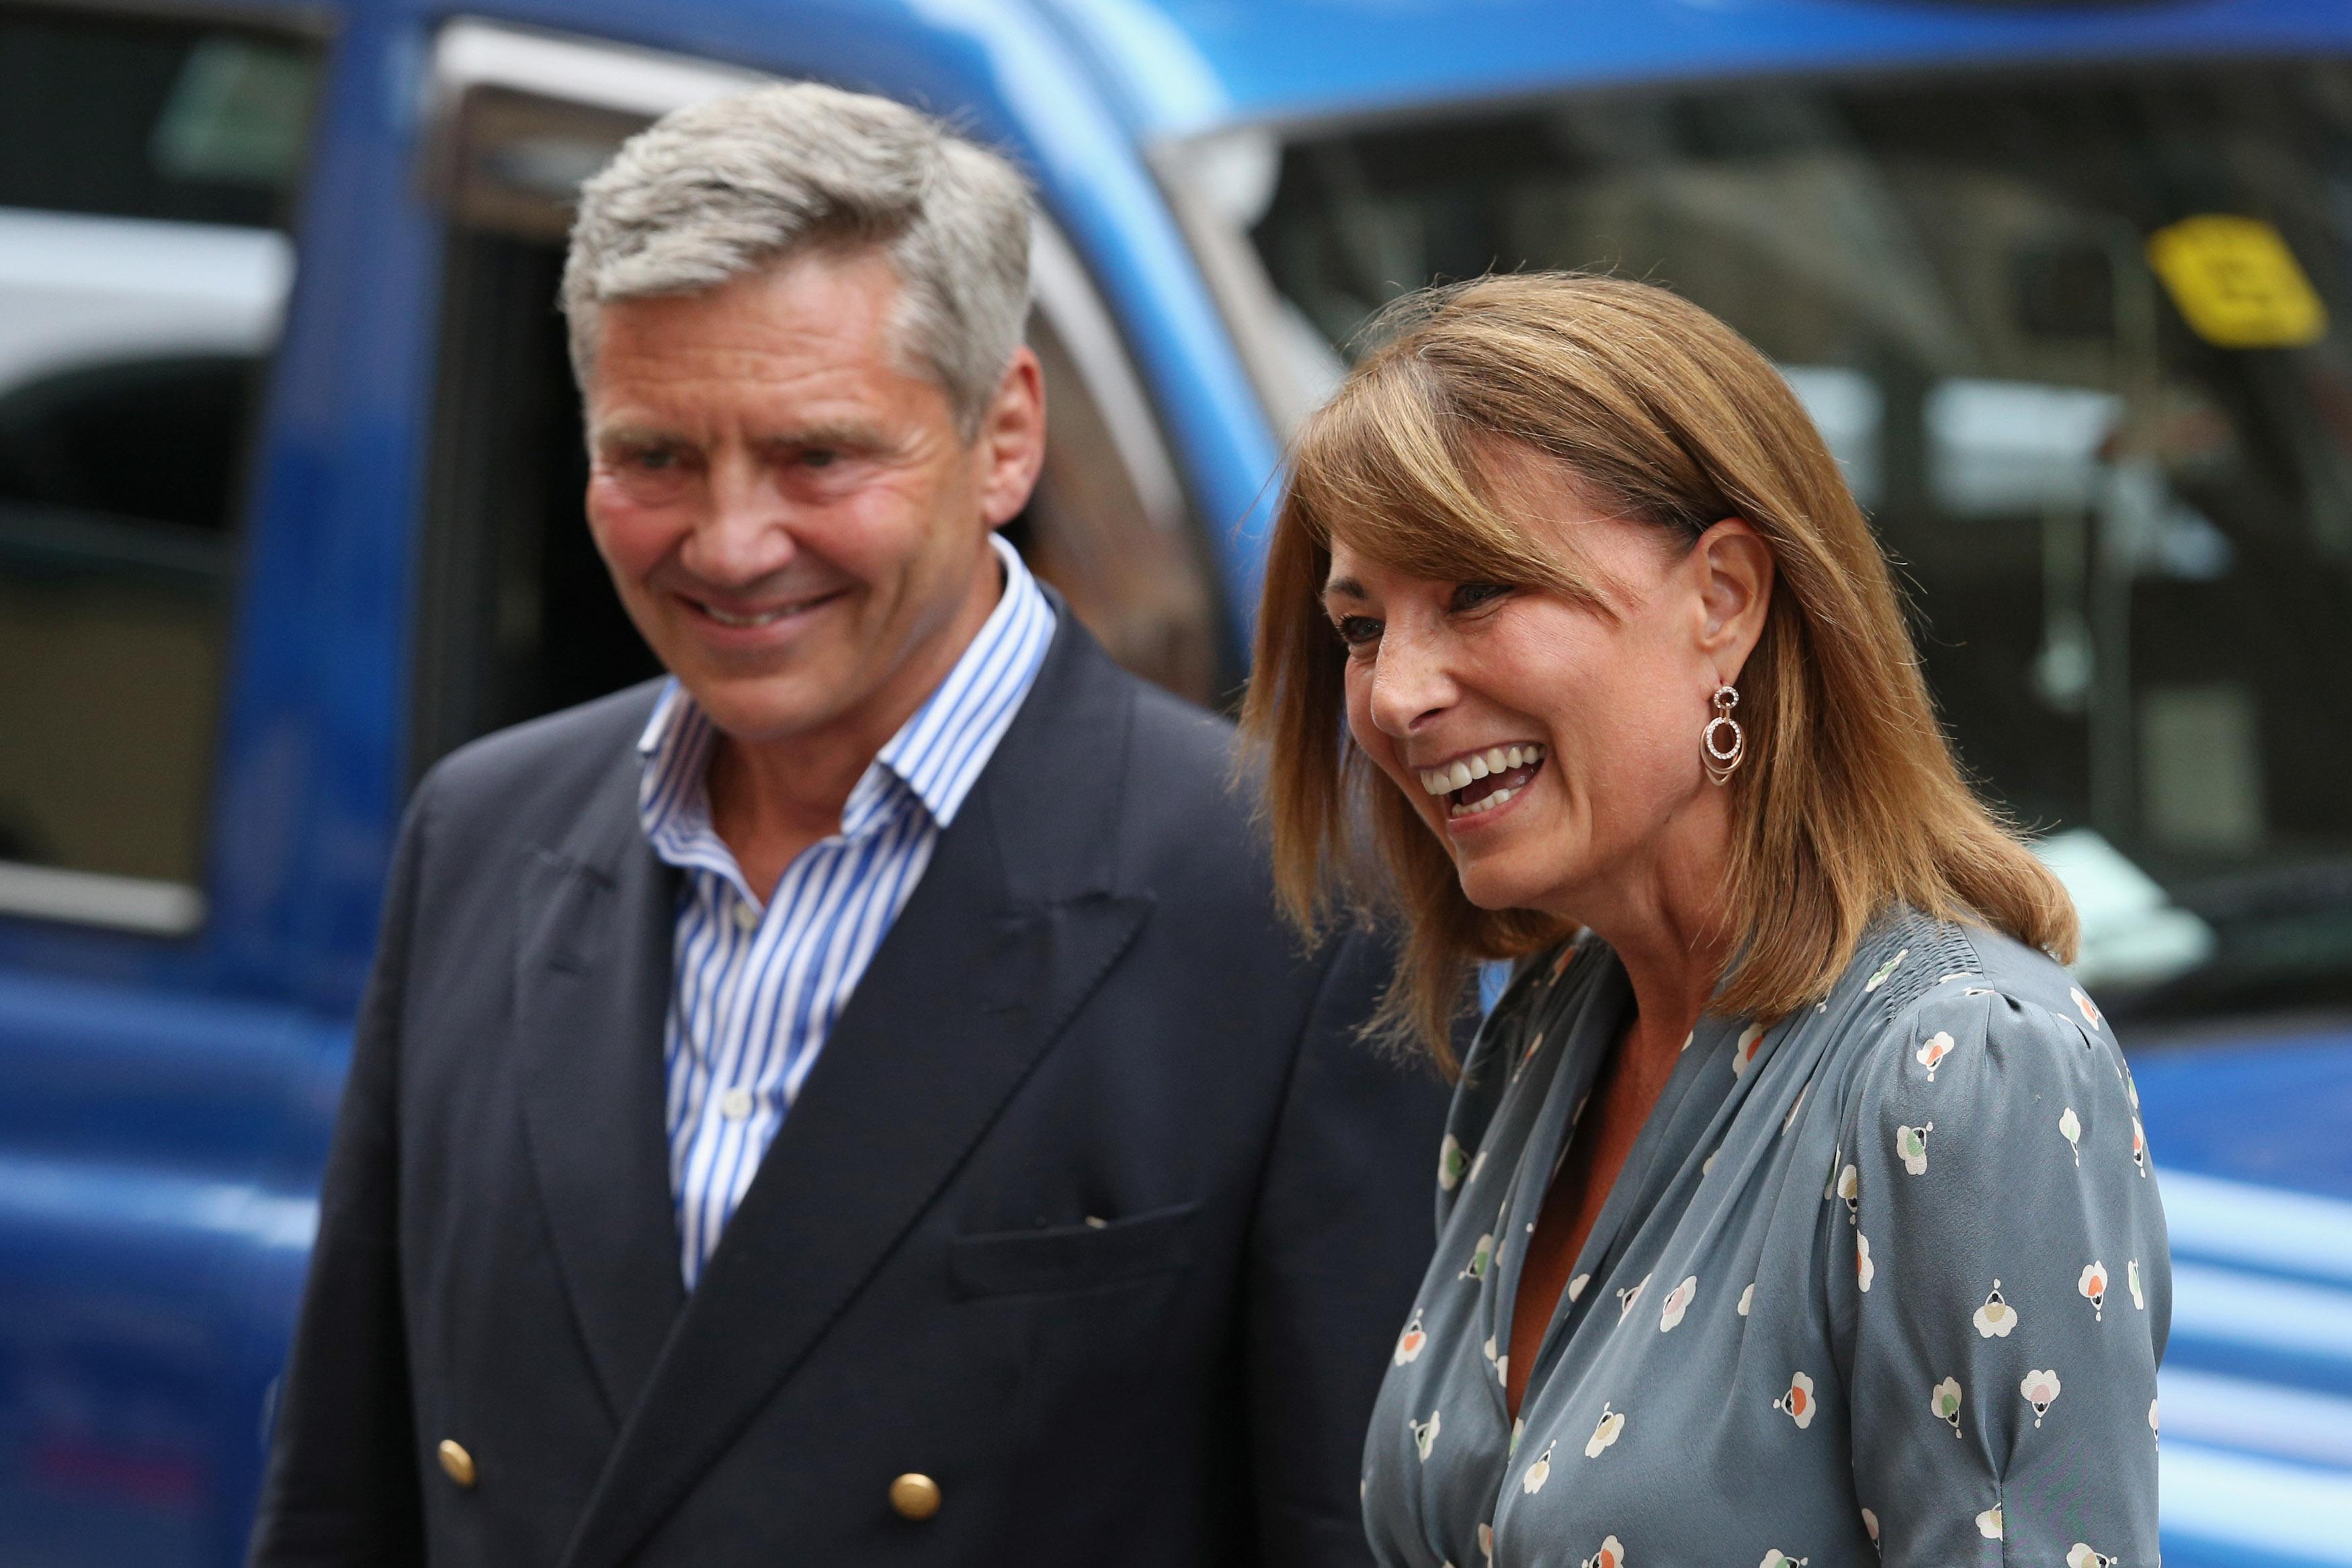 Carole Middleton and Michael Middleton